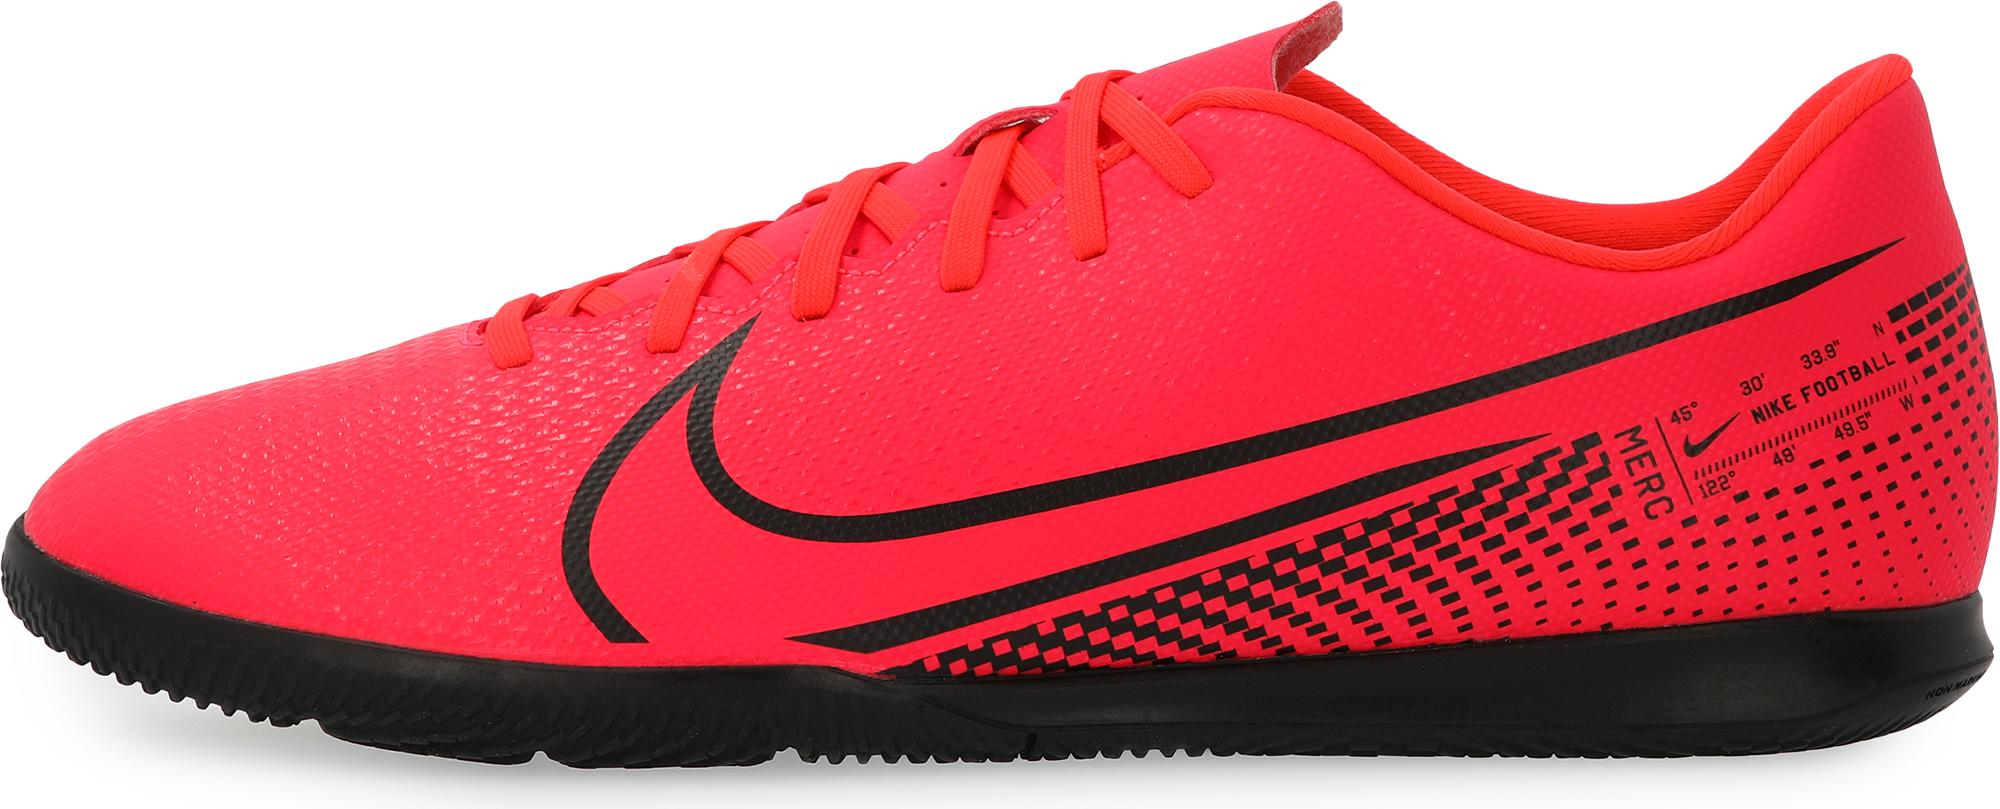 Nike Бутсы мужские Nike Mercurial Vapor 13 Club IC, размер 40 рюкзак nike vapor energy ba5538 011